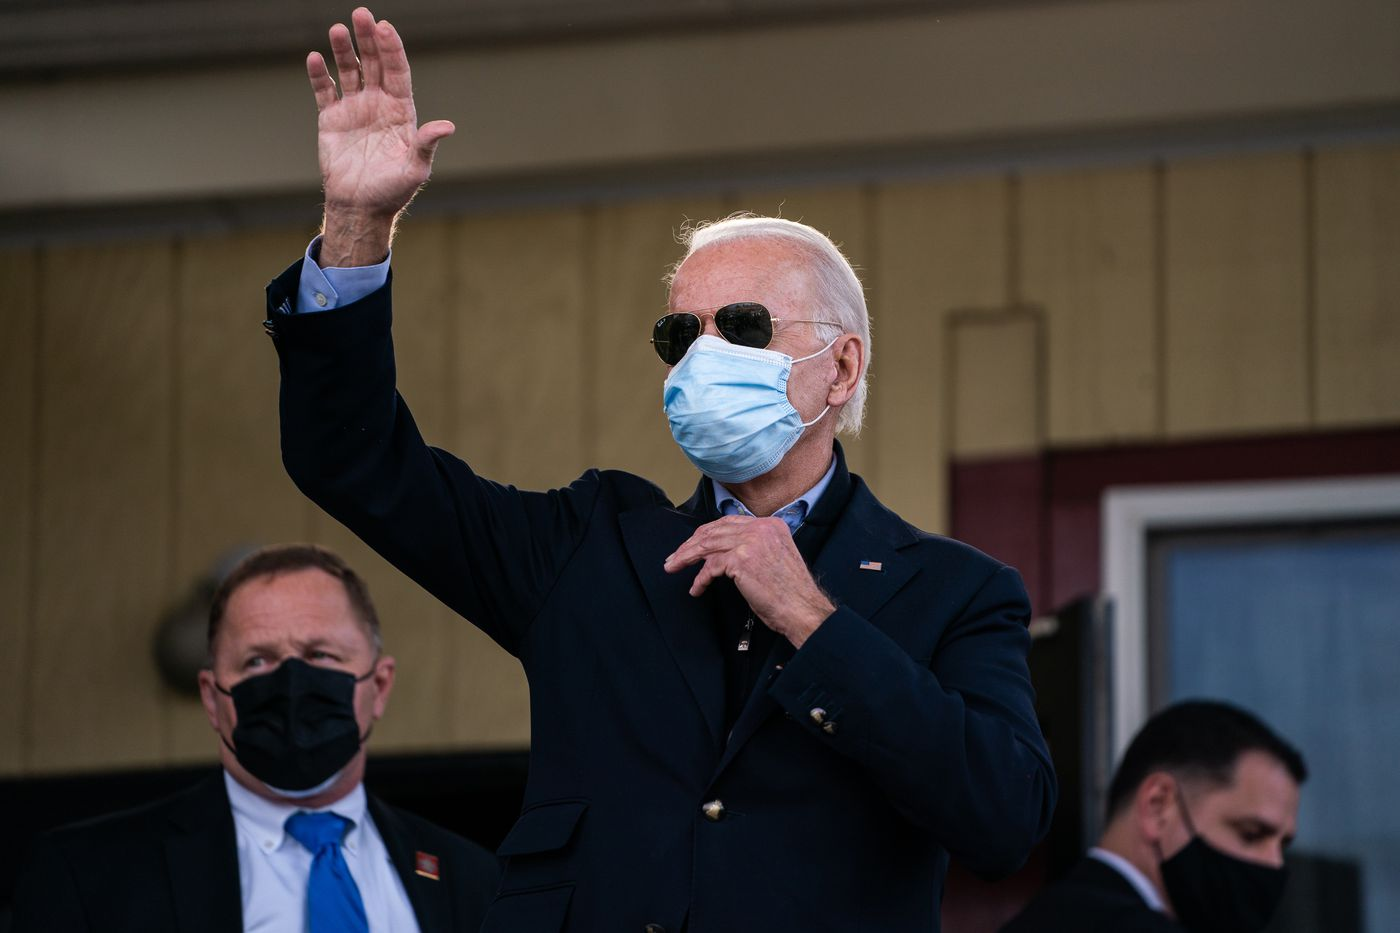 Former vice president Joe Biden stops by a restaurant in Philadelphia. Washington Post photo by Demetrius Freeman